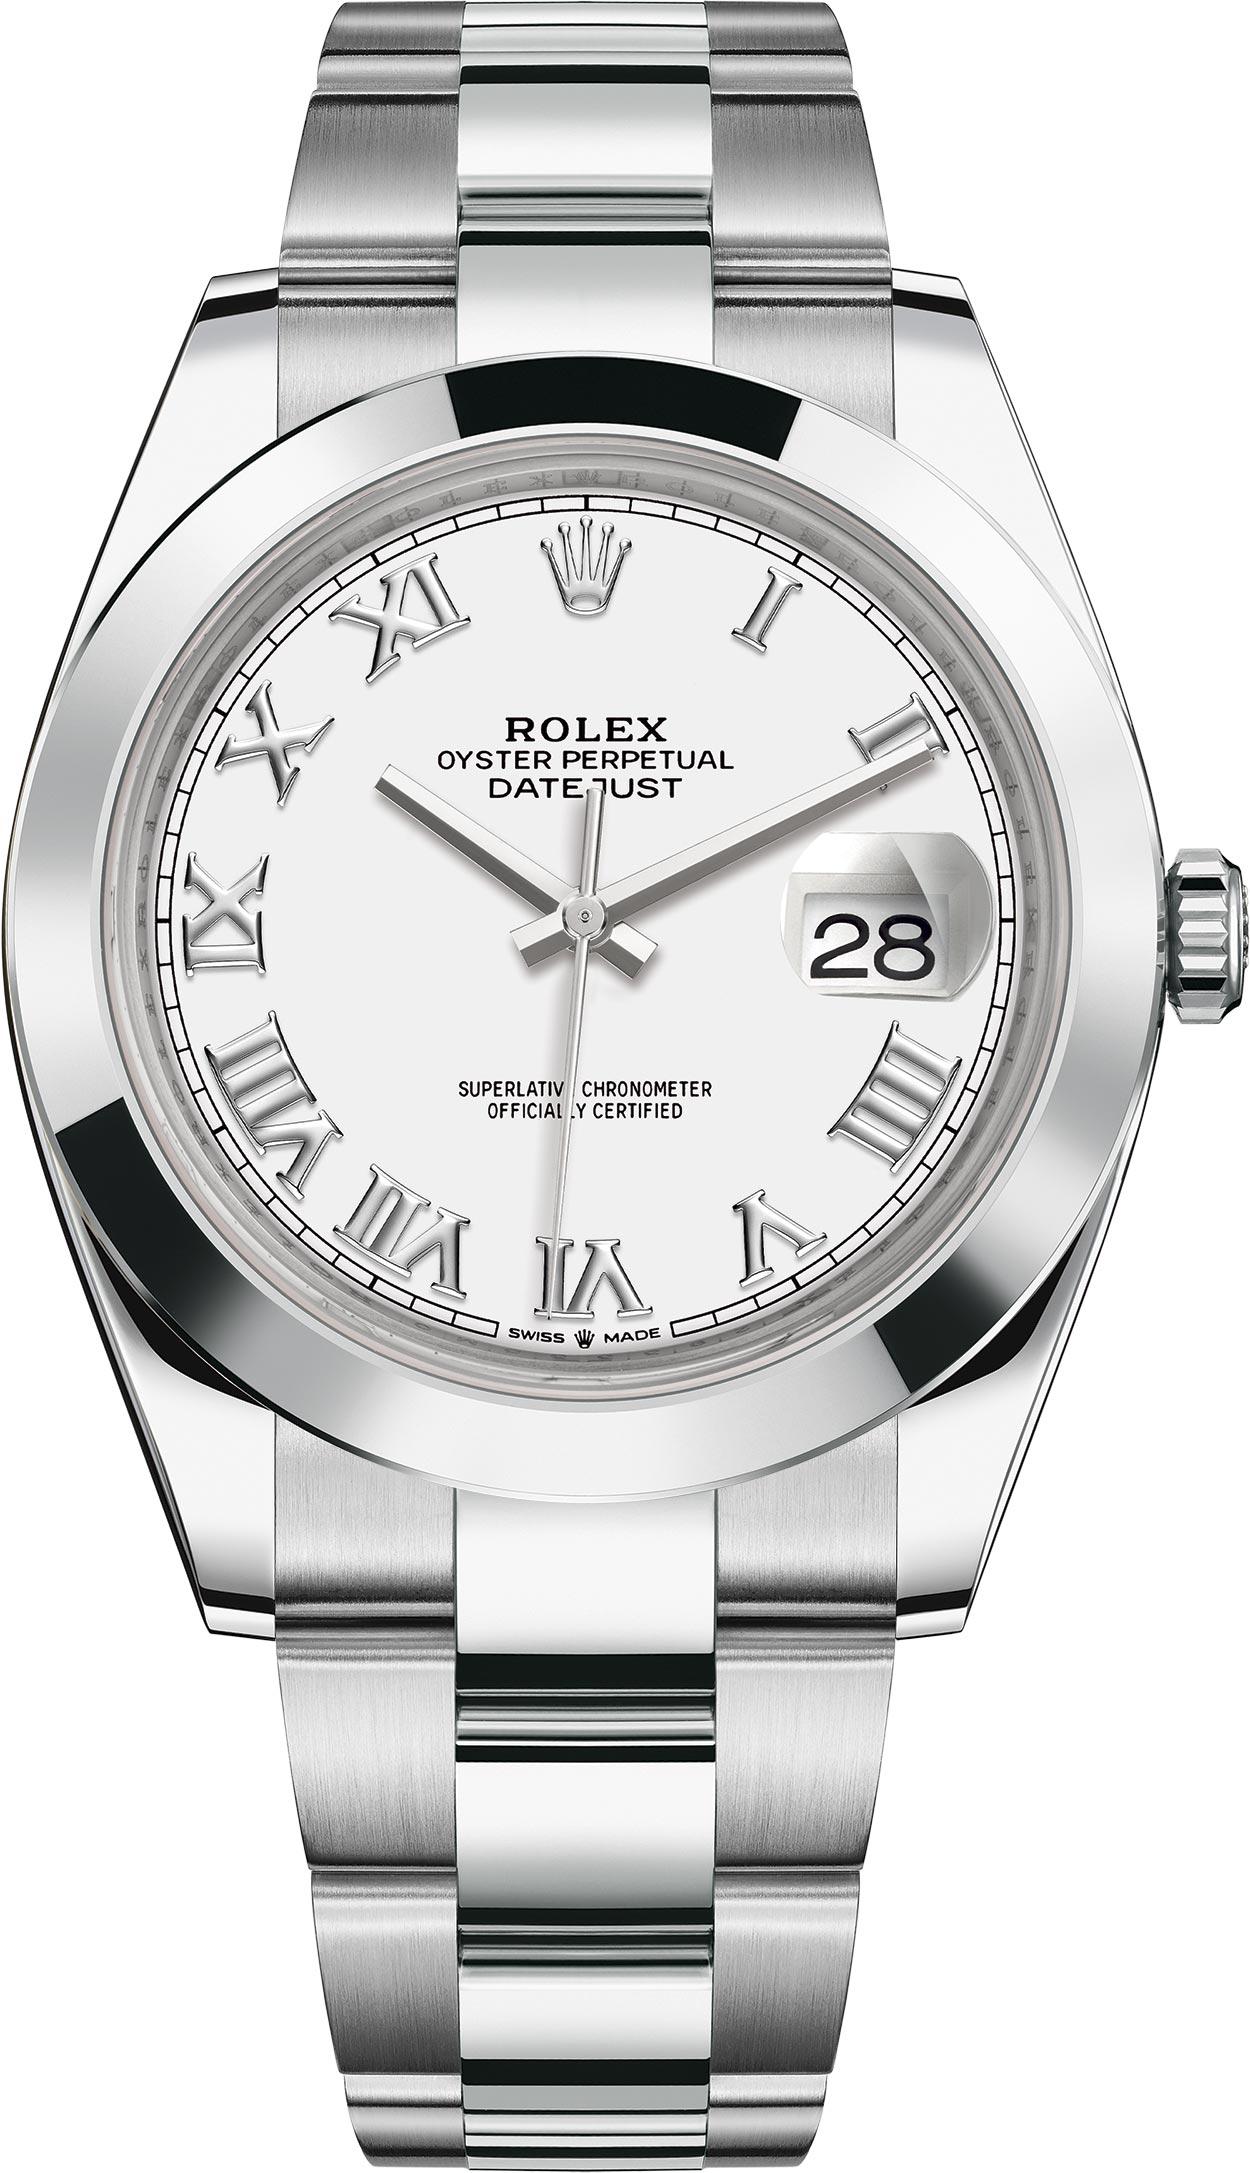 ROLEX DATEJUST 41MM STAINLESS STEEL WHITE DIAL ROMAN NUMERALS REF: 126300